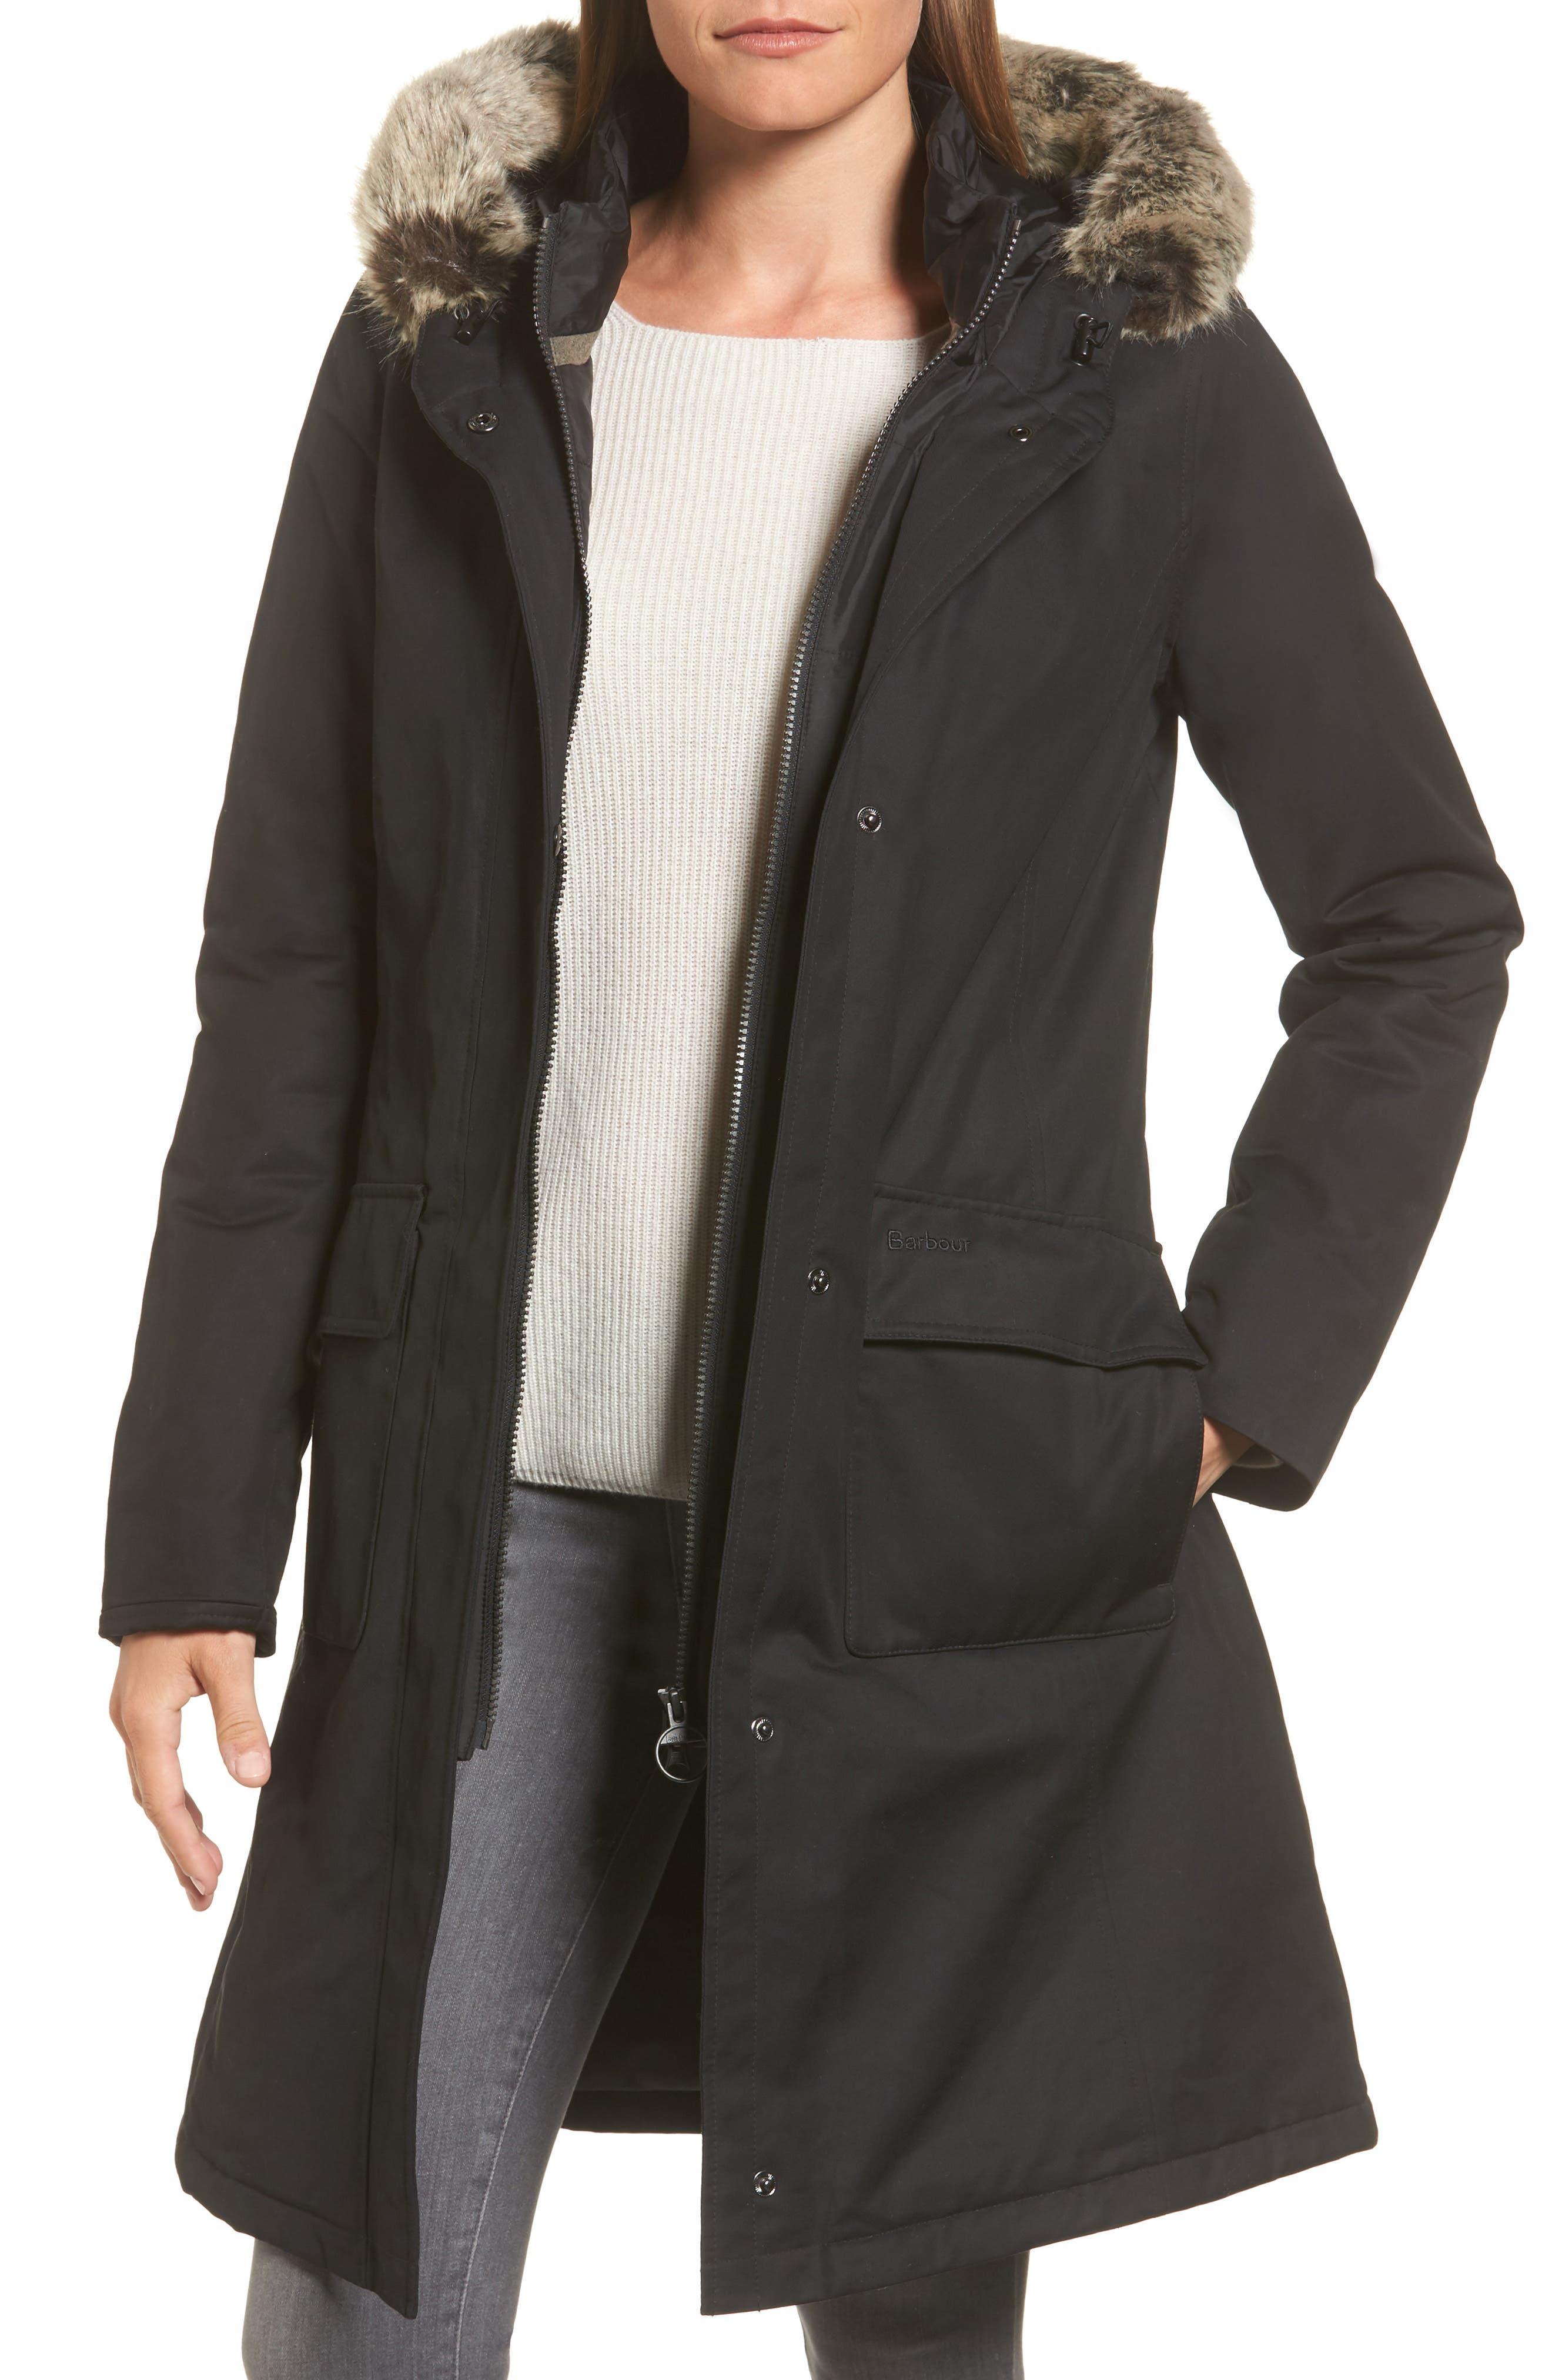 Main Image - Barbour Linton Hooded Waterproof Jacket with Faux Fur Trim